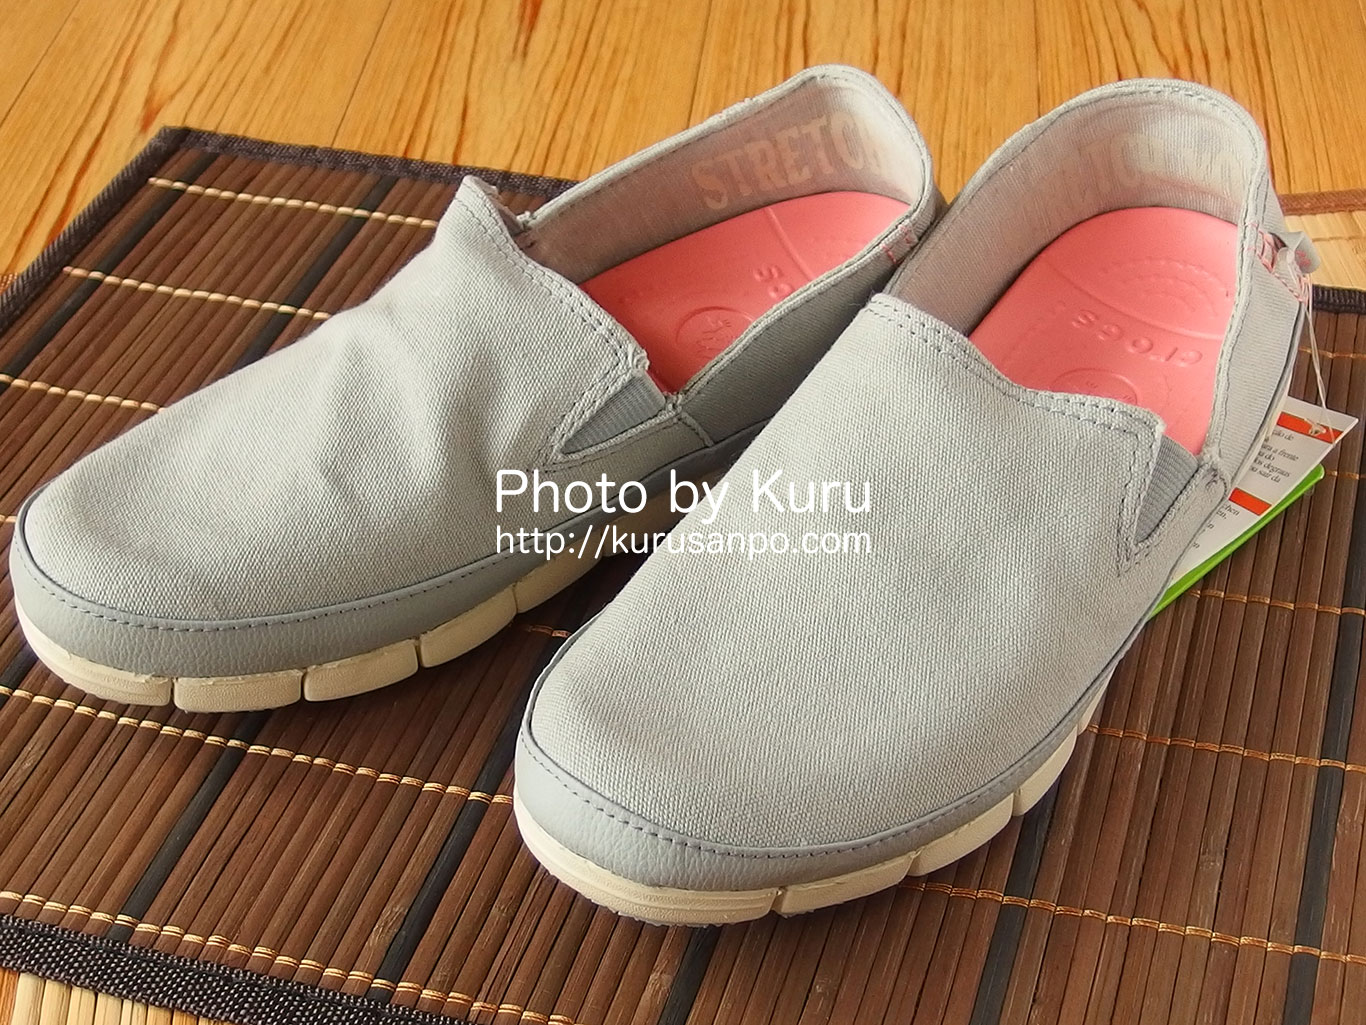 crocs(クロックス)の『stretch sole loafer w(ストレッチ ソール ローファー ウィメン)』